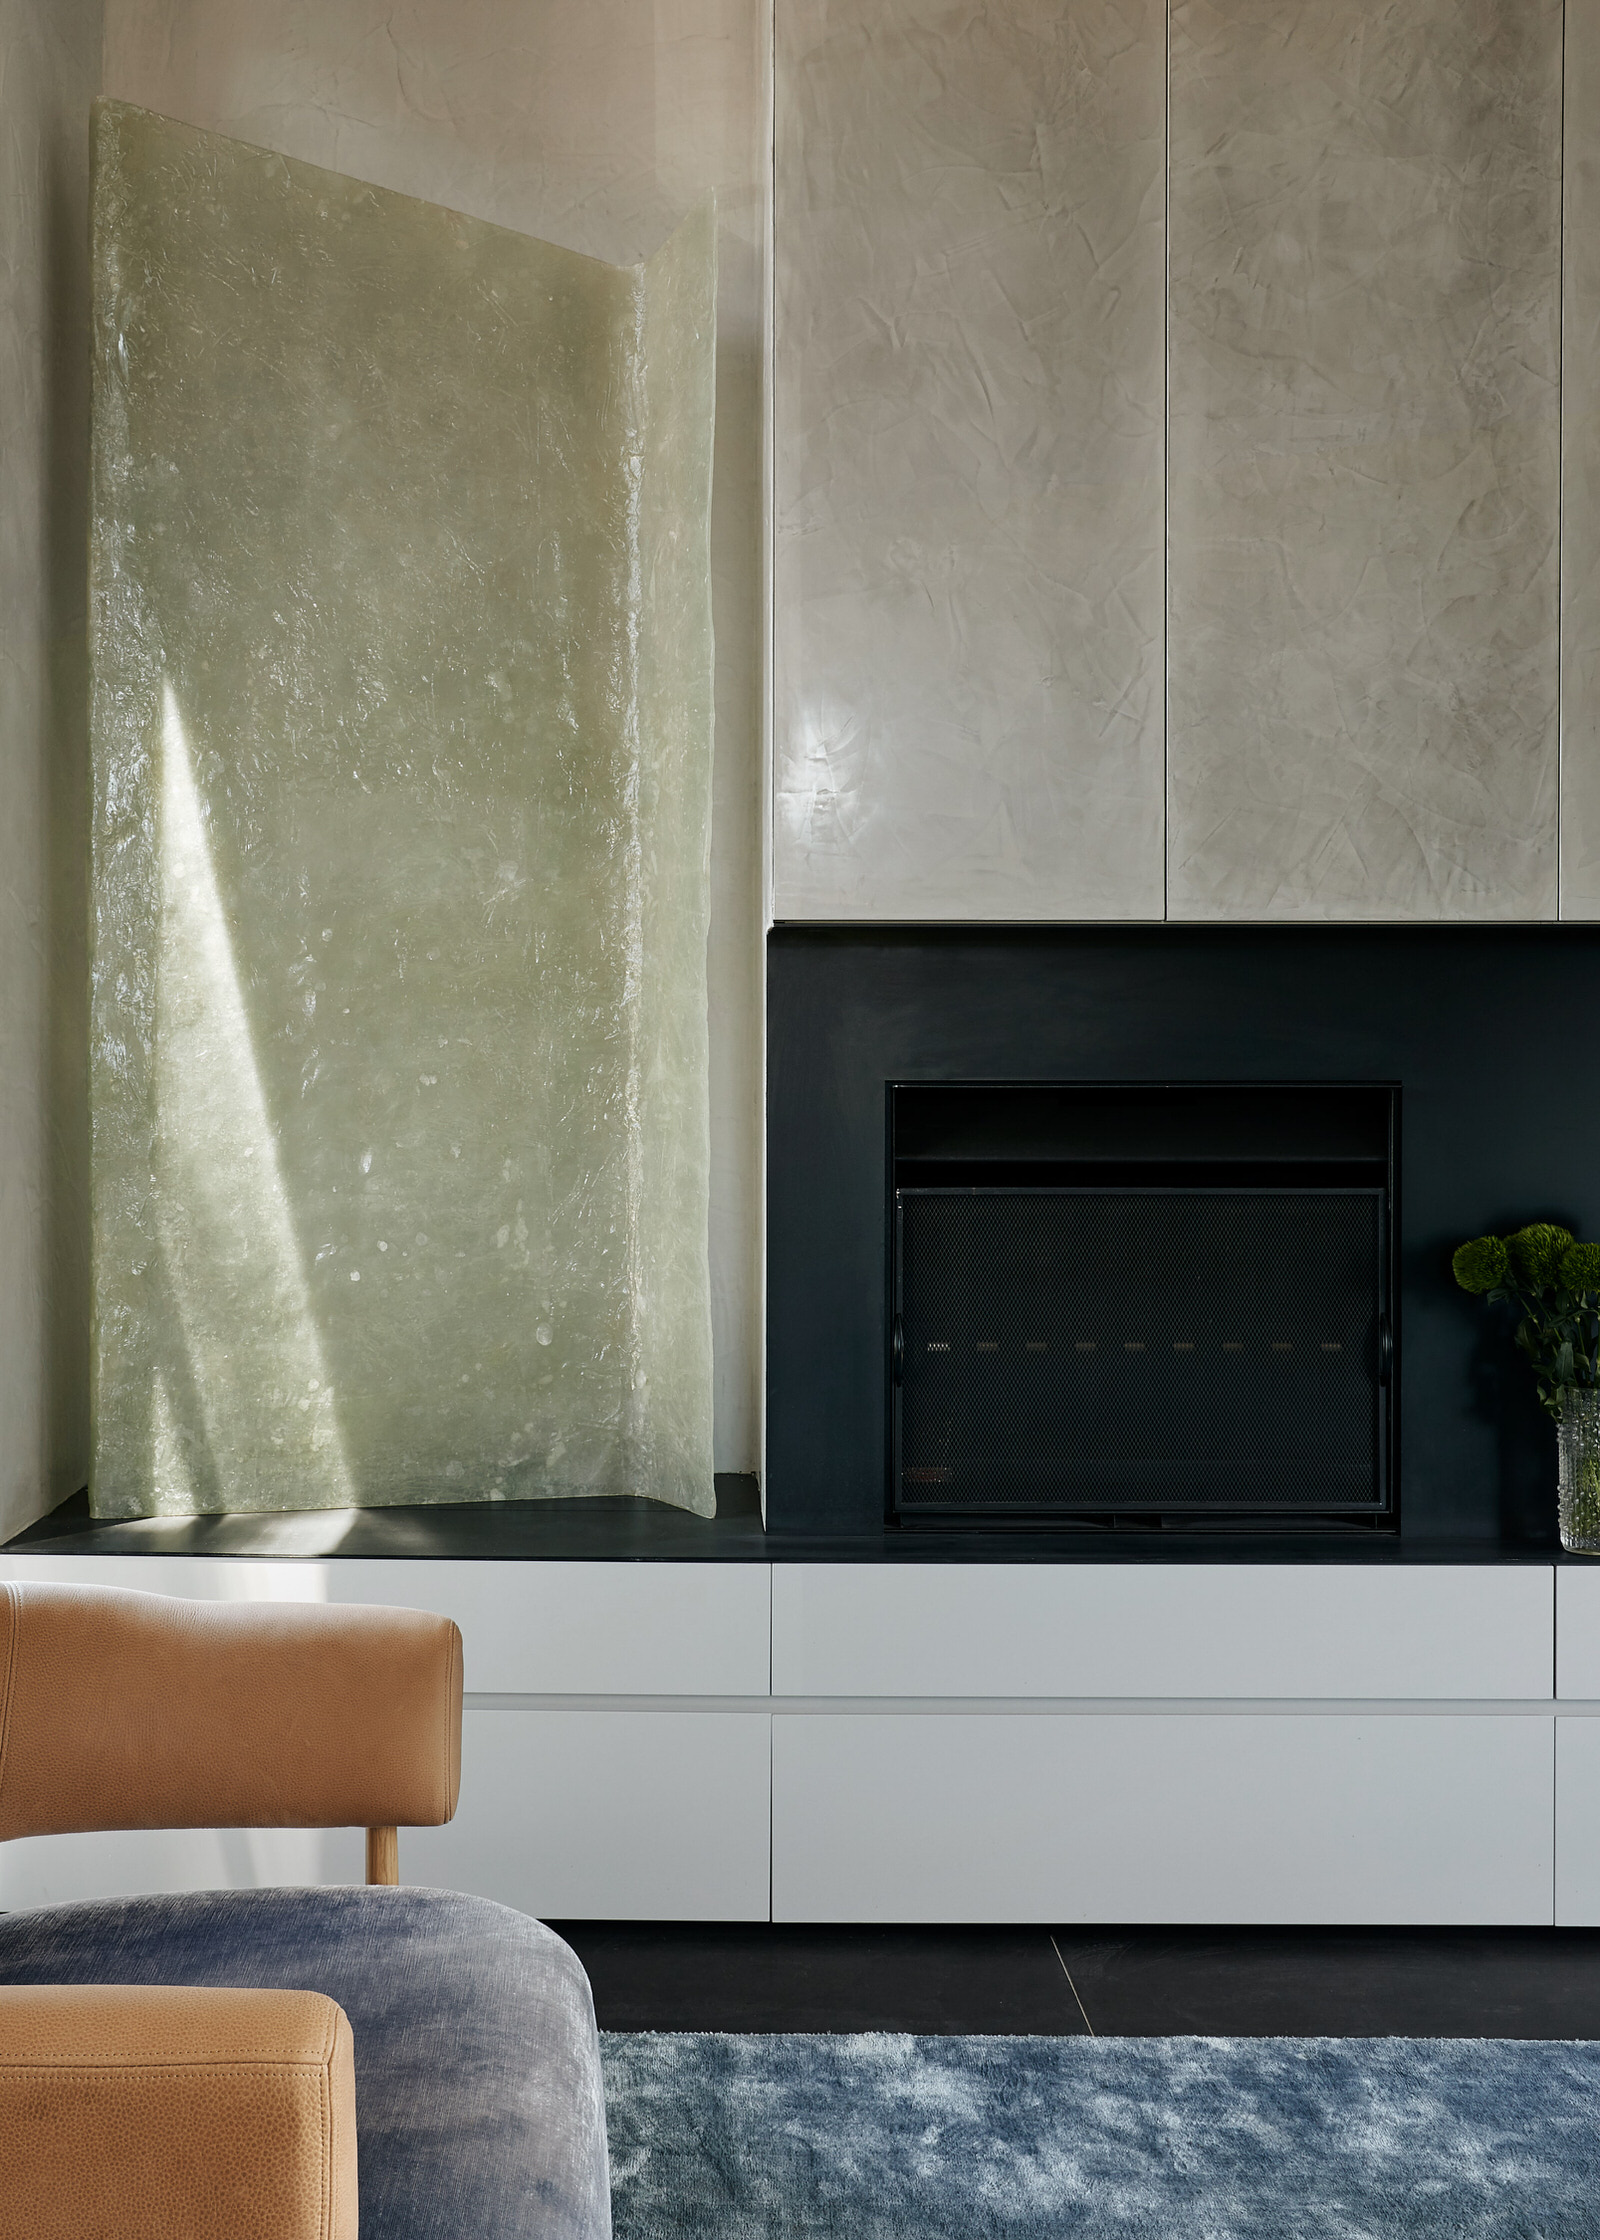 Fiona Lynch Burnley House Australian Interior Design Photo Amelia Stanwix Yellowtrace 06